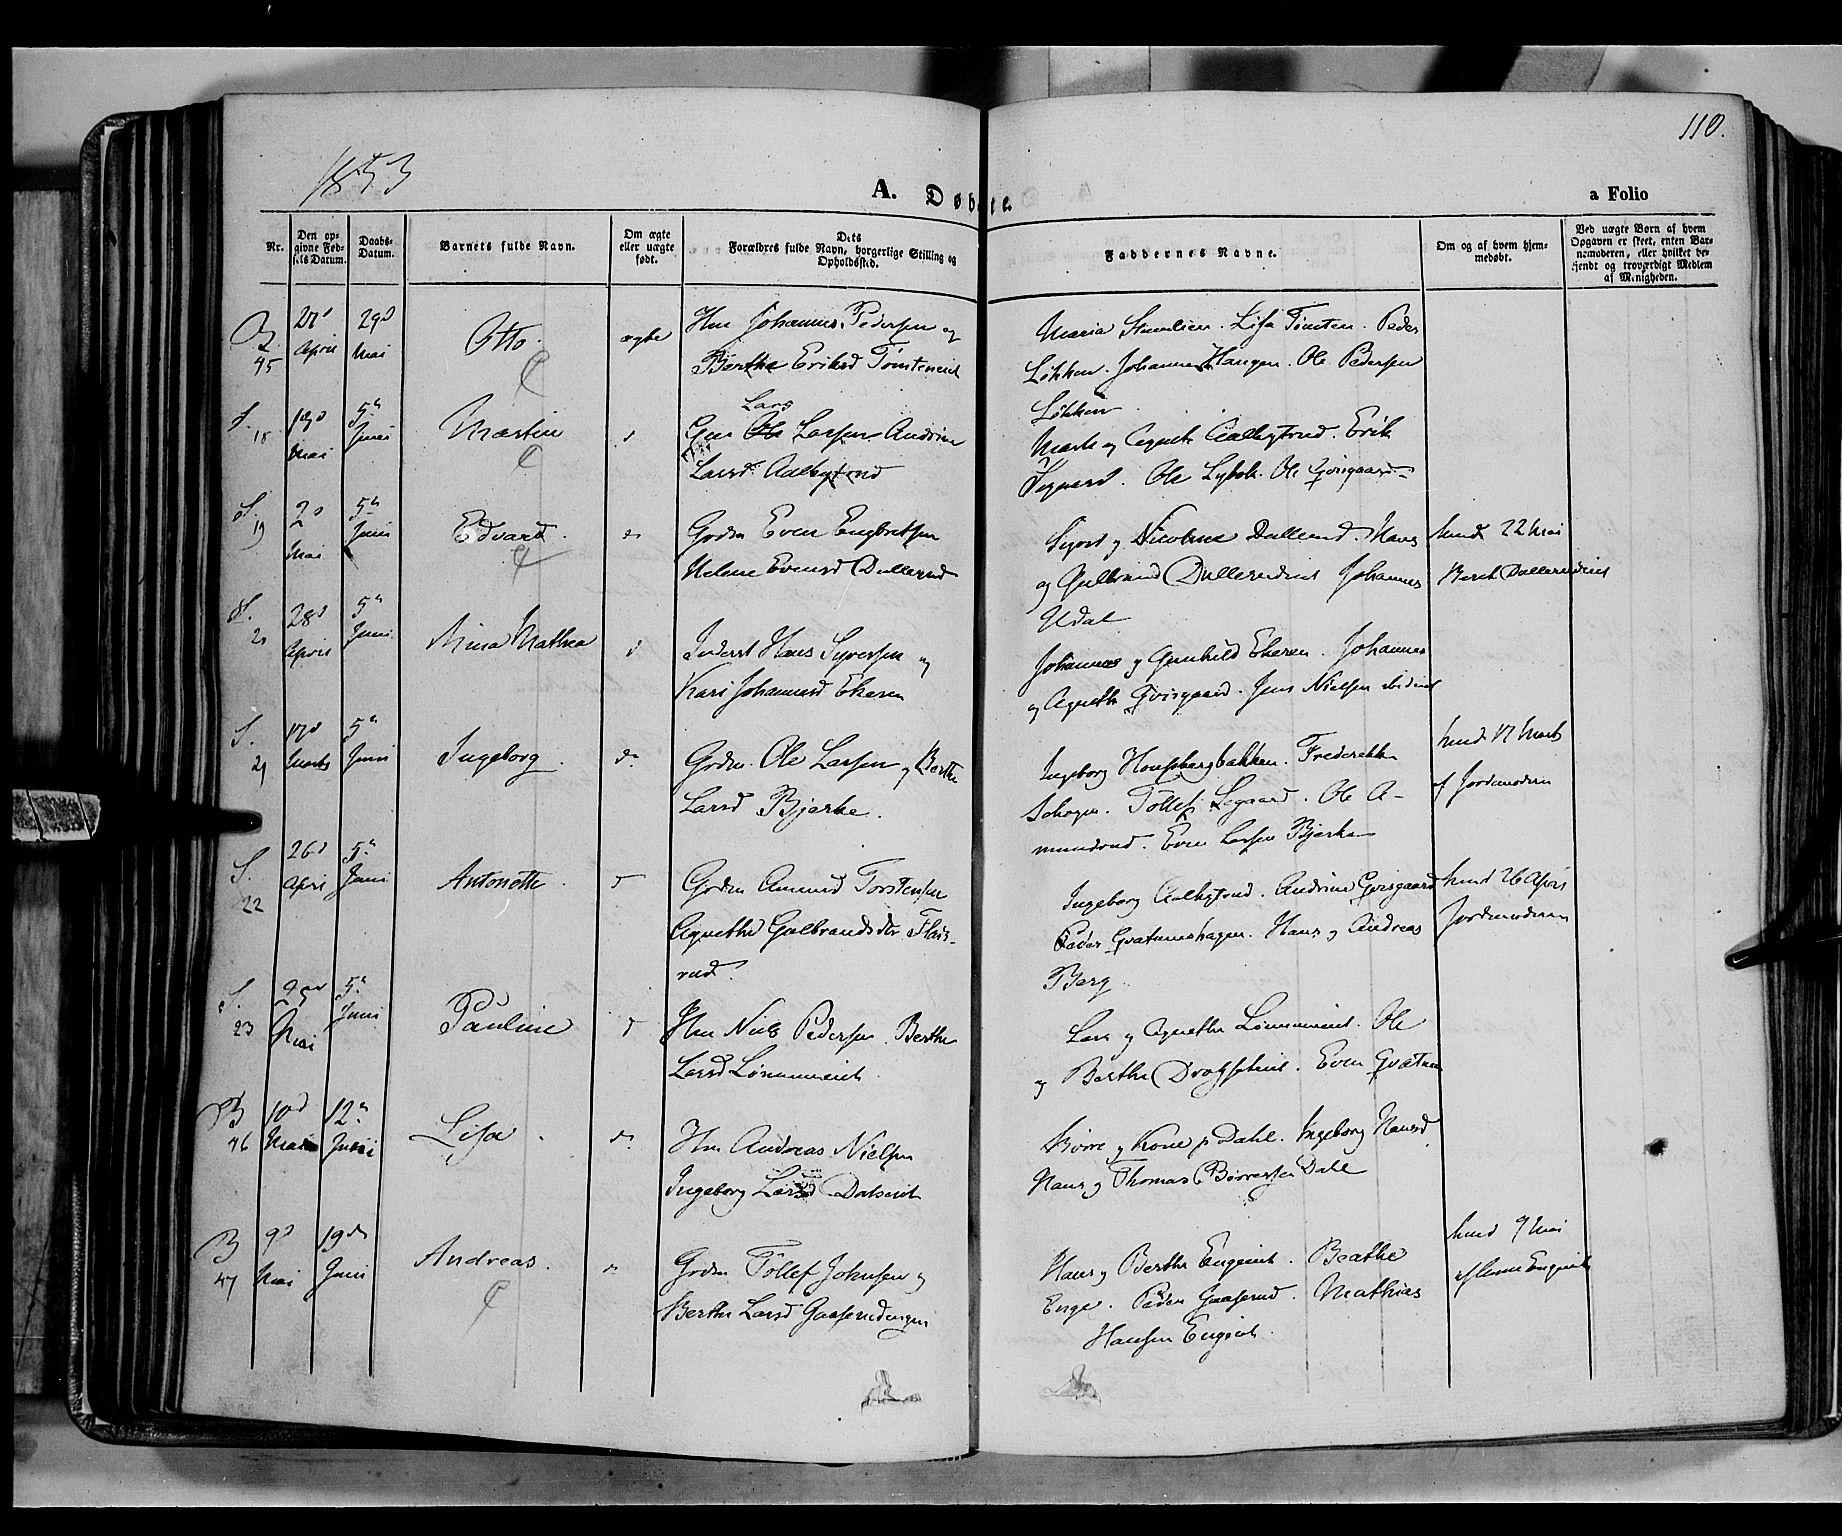 SAH, Biri prestekontor, Ministerialbok nr. 5, 1843-1854, s. 110